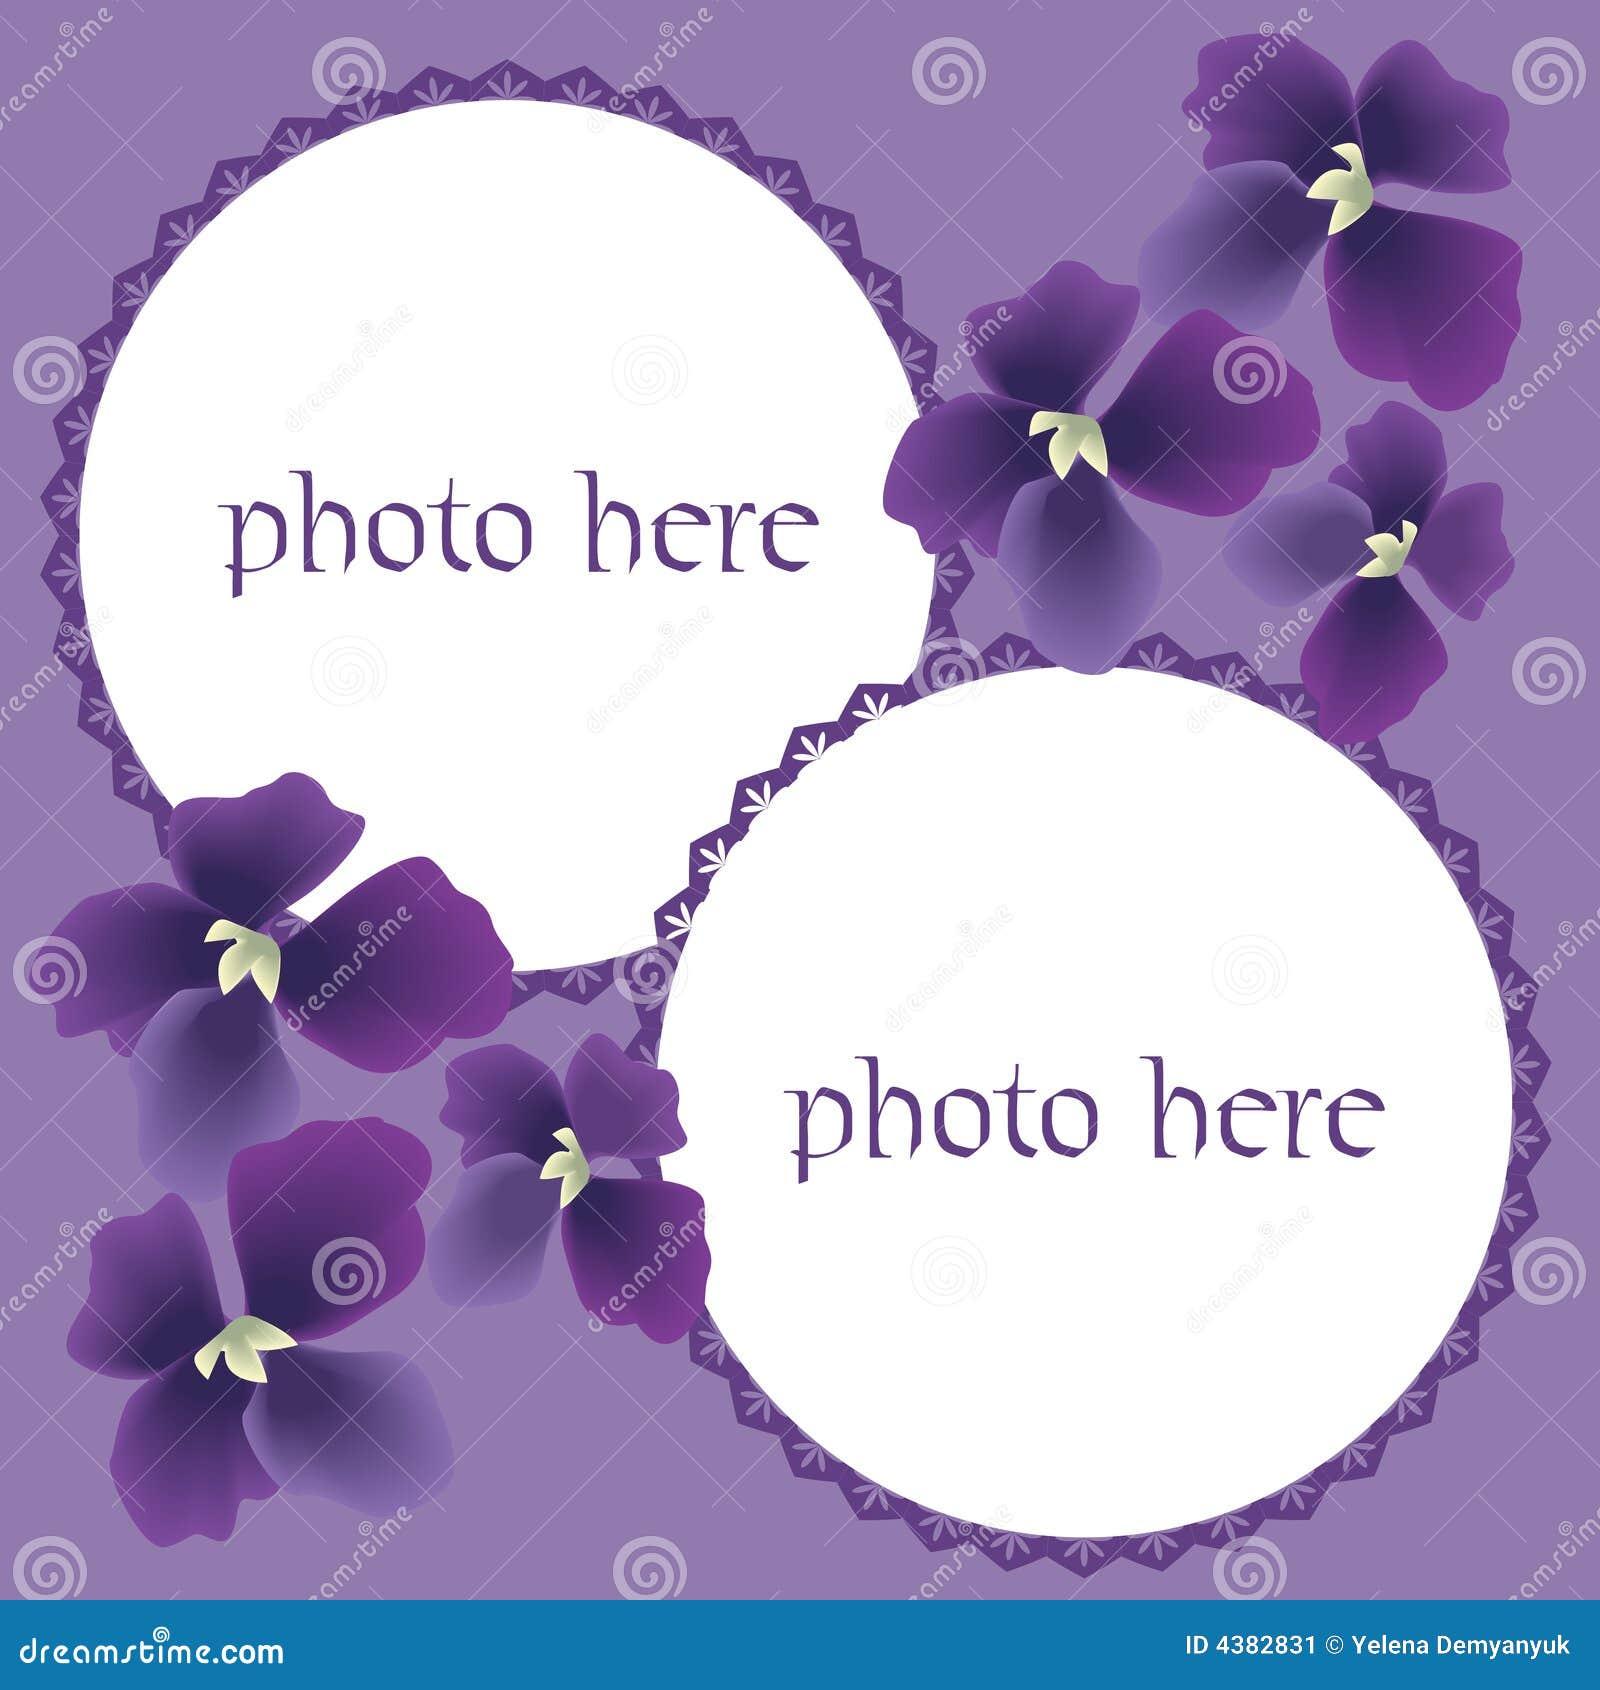 Vector scrapbooking,pictures border with violas